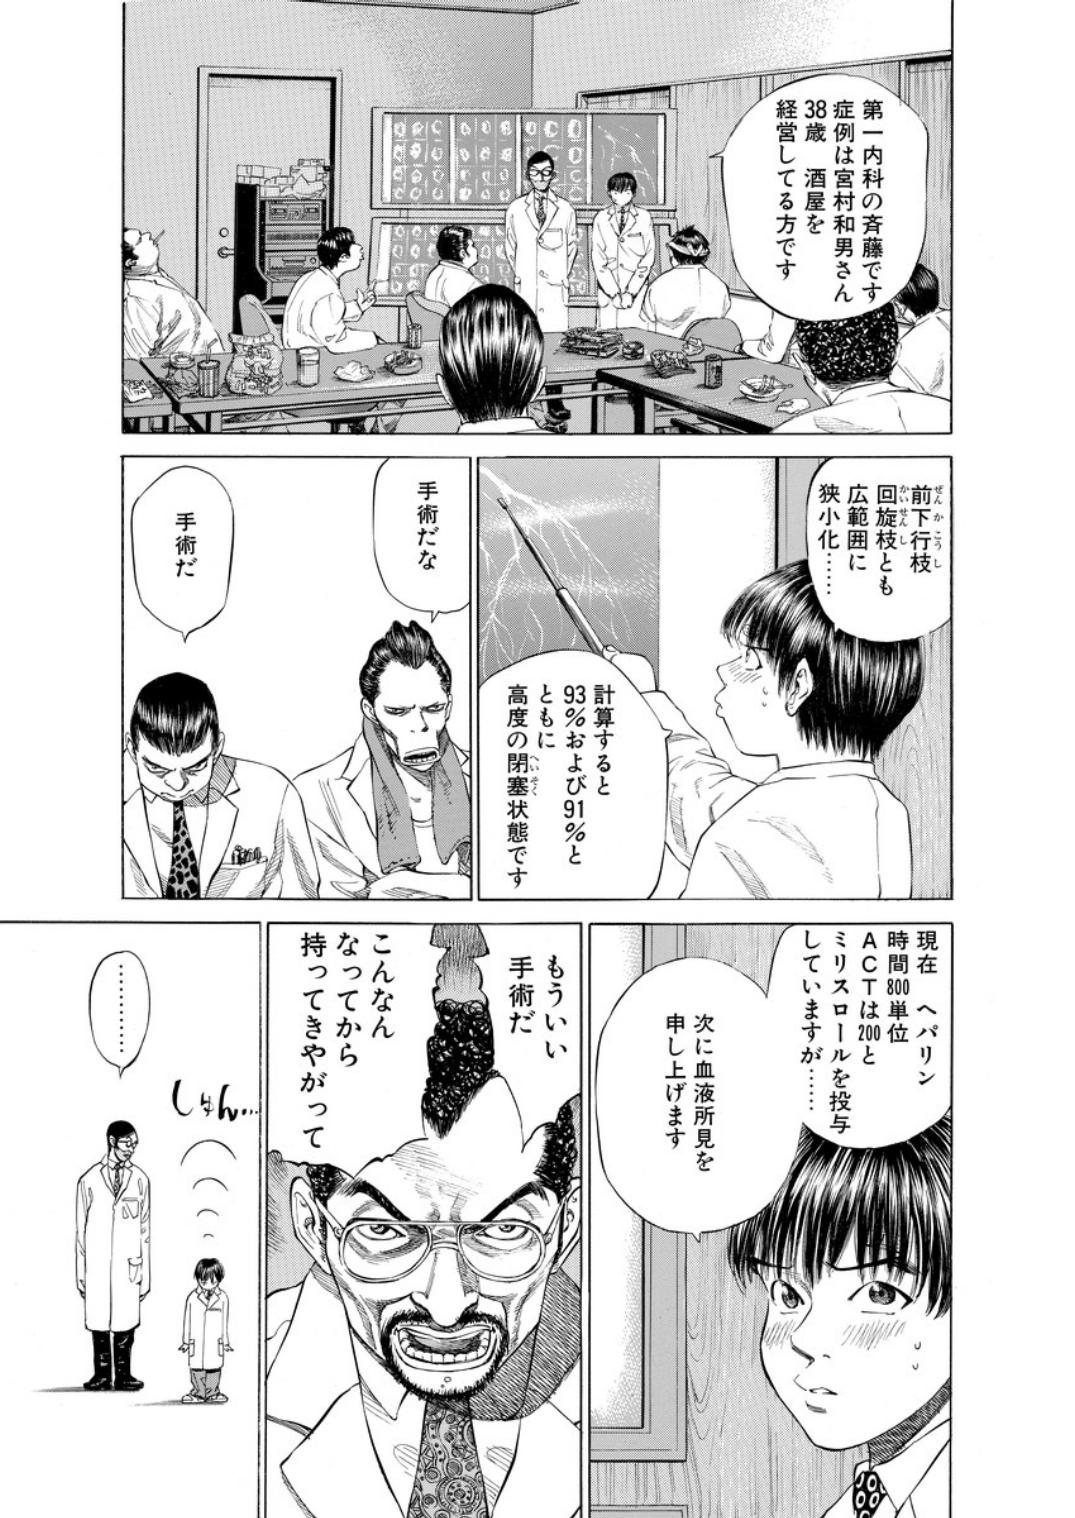 001bj_page-0197.jpg